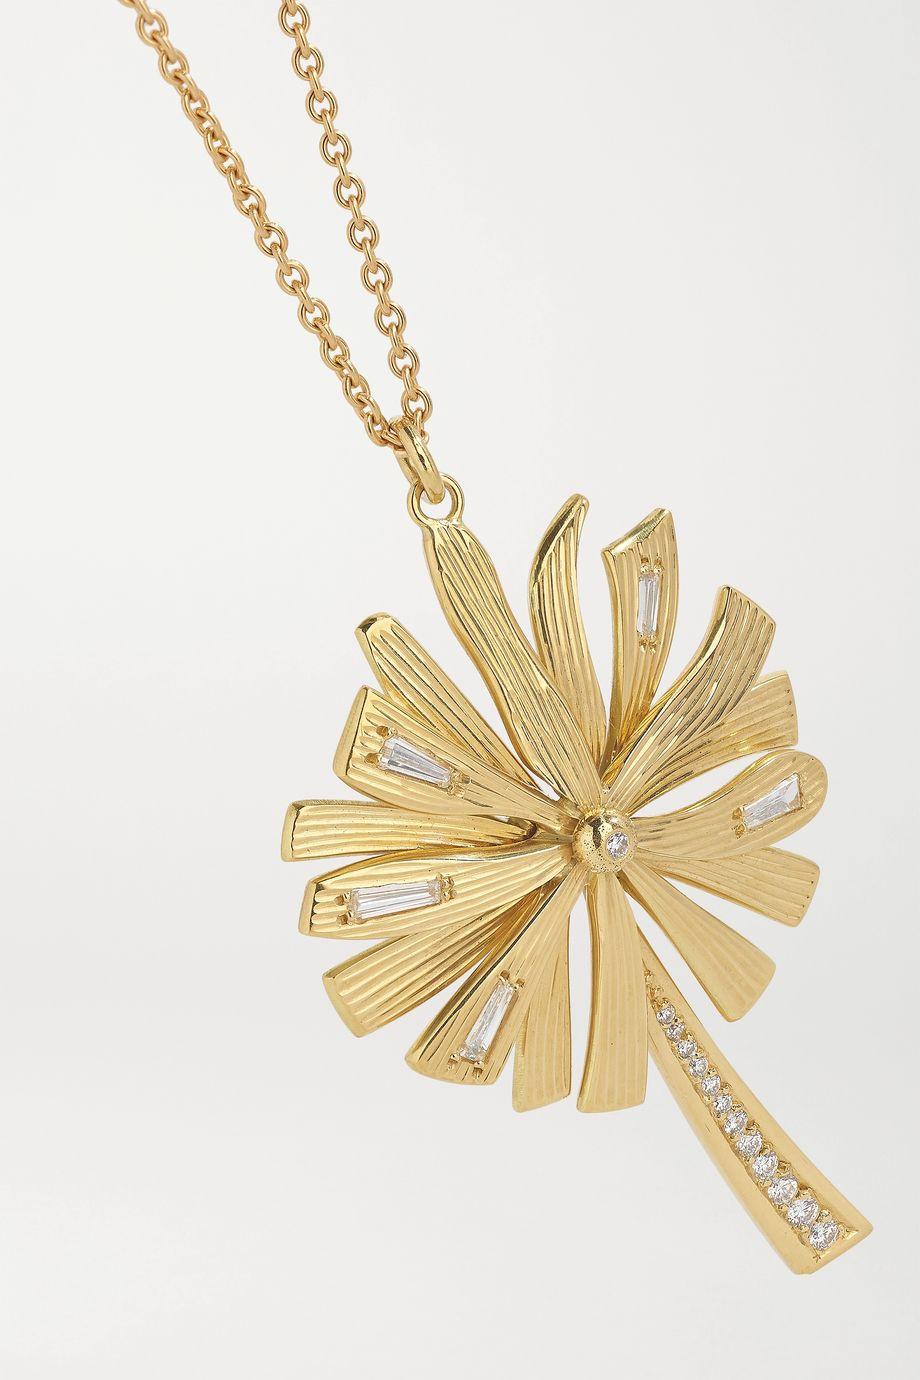 Brooke Gregson Dandelion Wish 18-karat gold diamond necklace